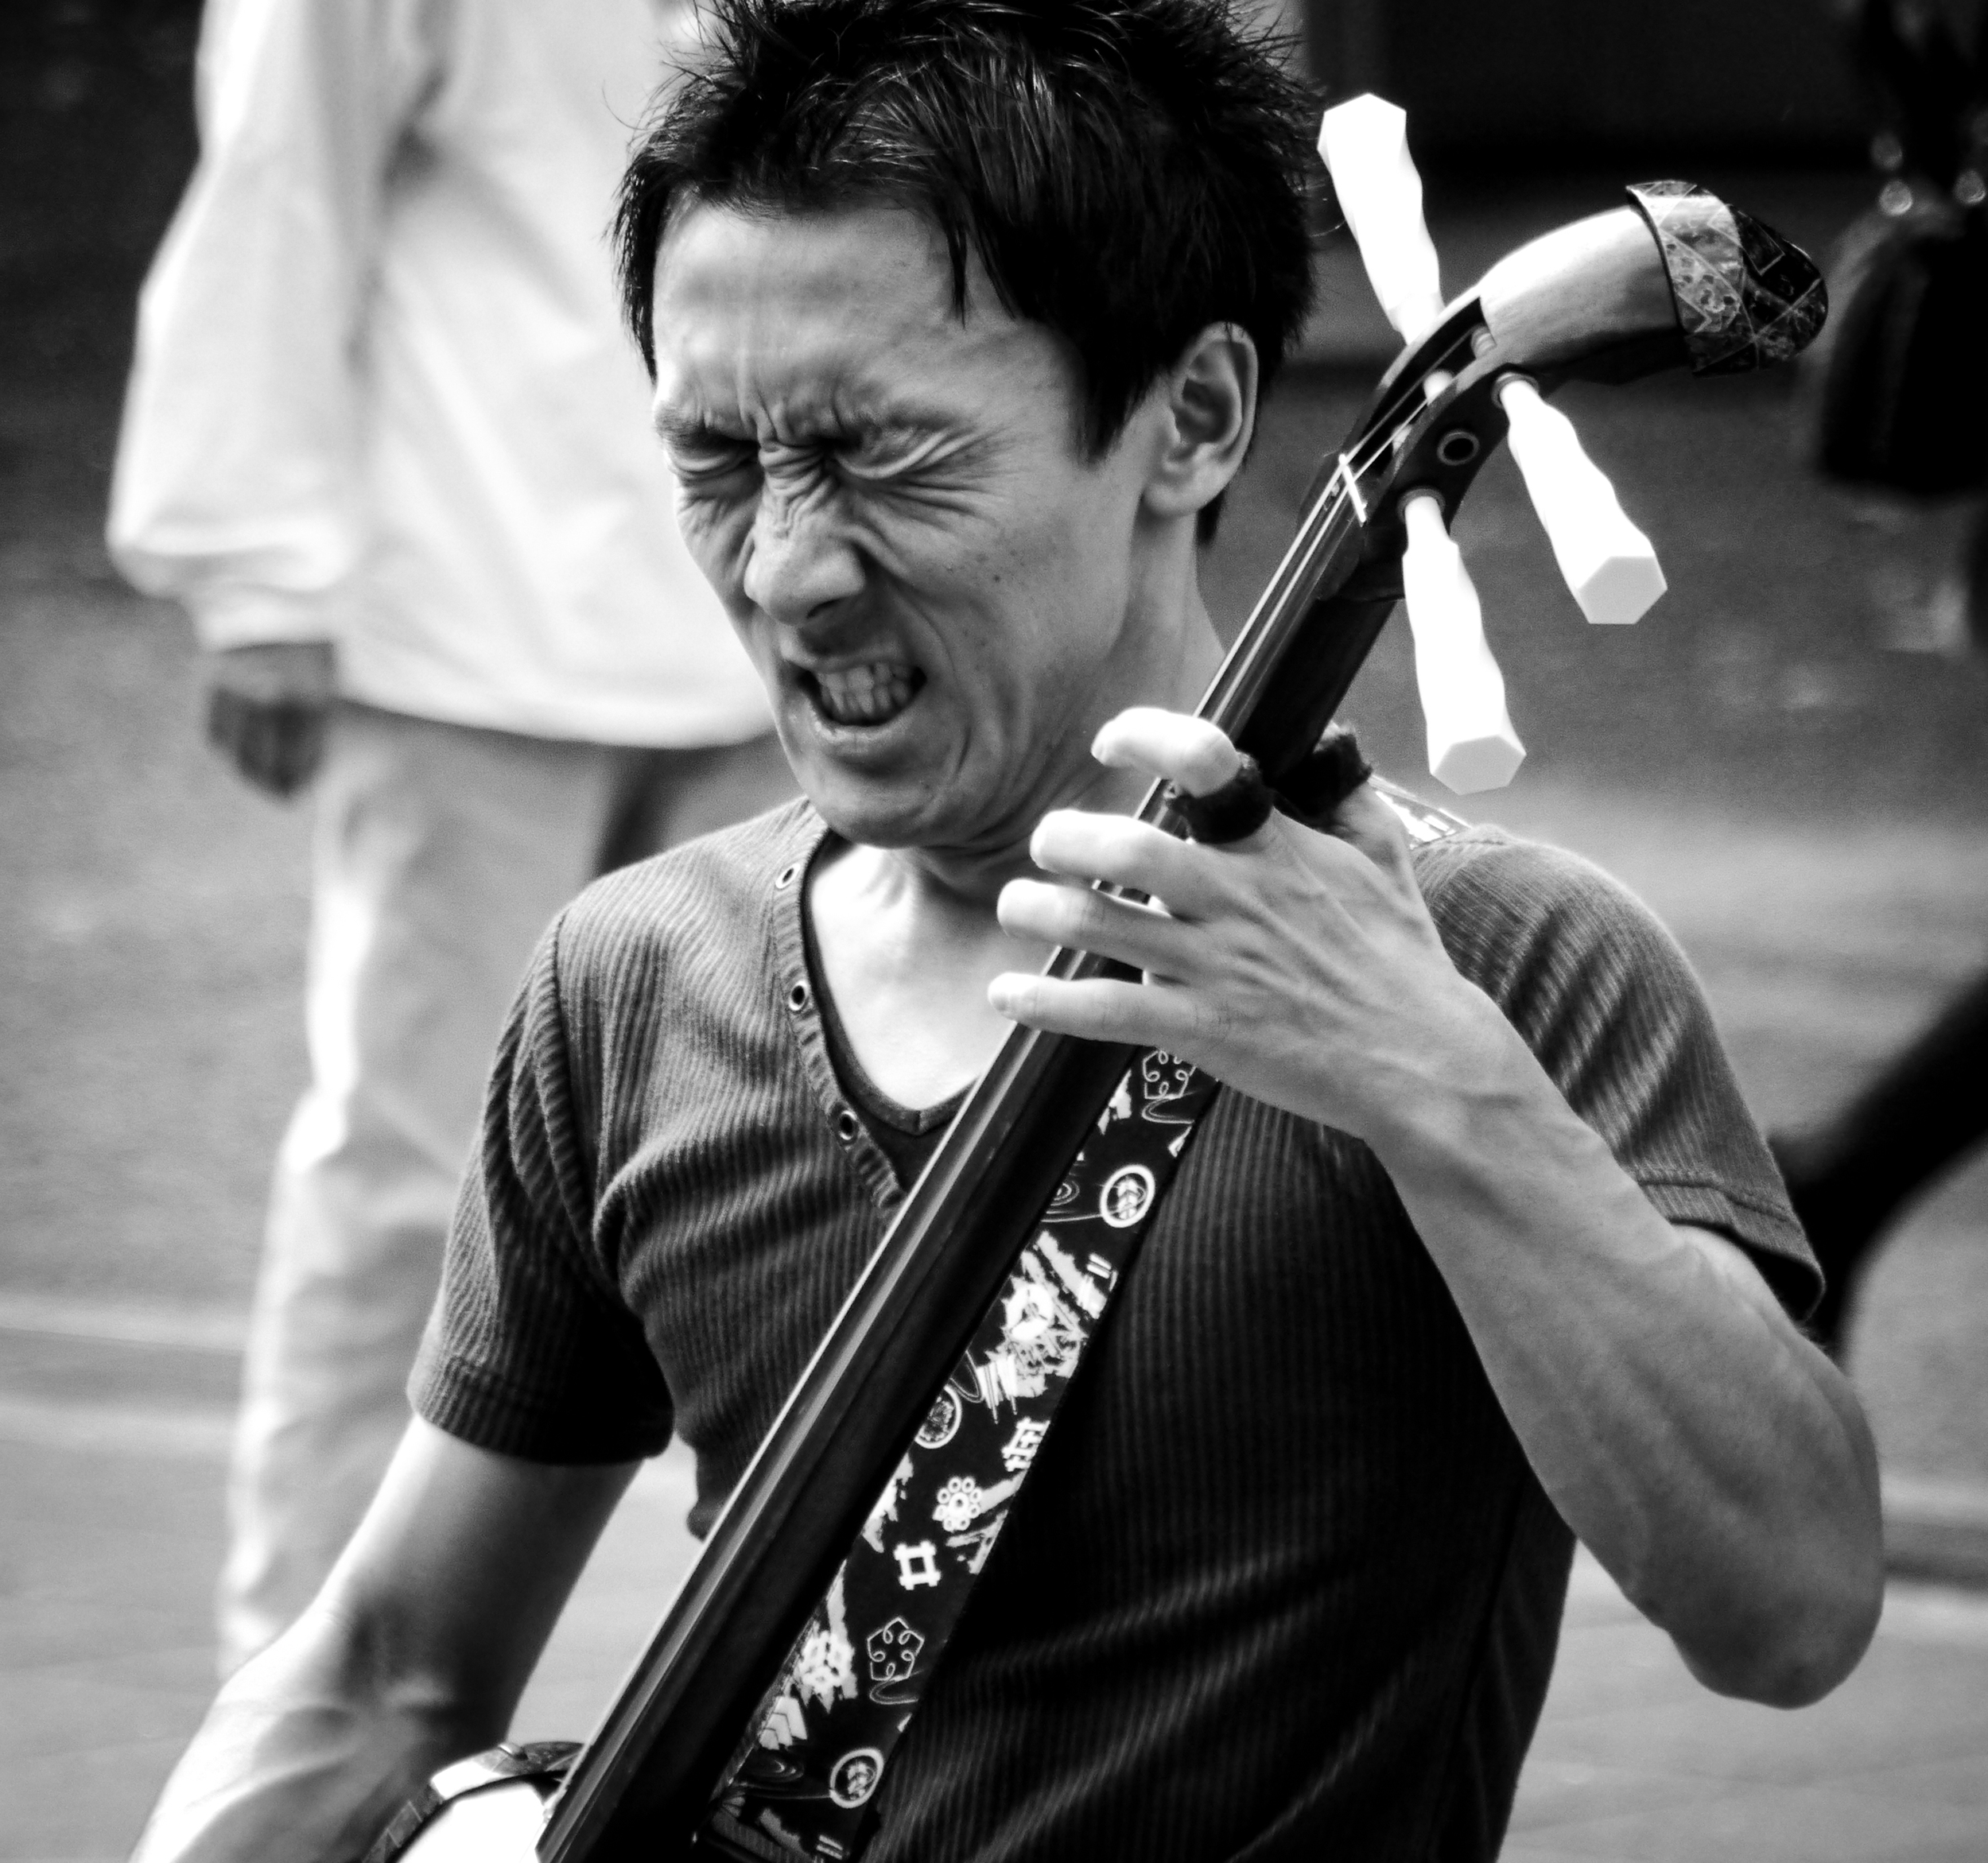 japan-trip-2012-31.jpg